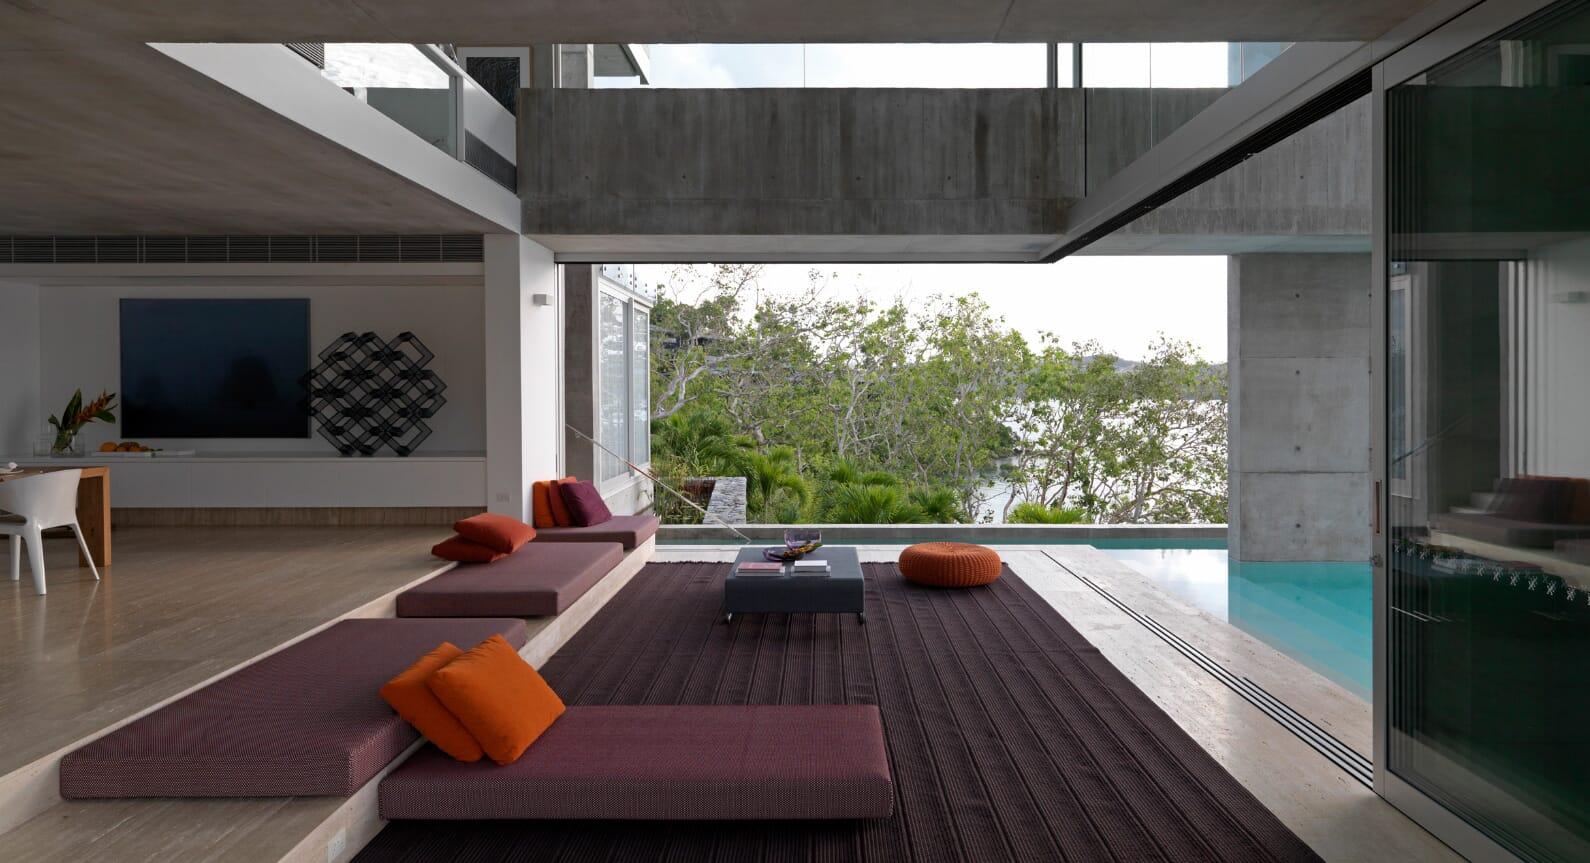 Tropical Paradise: The Solis House by Renato D'Ettorre Architects